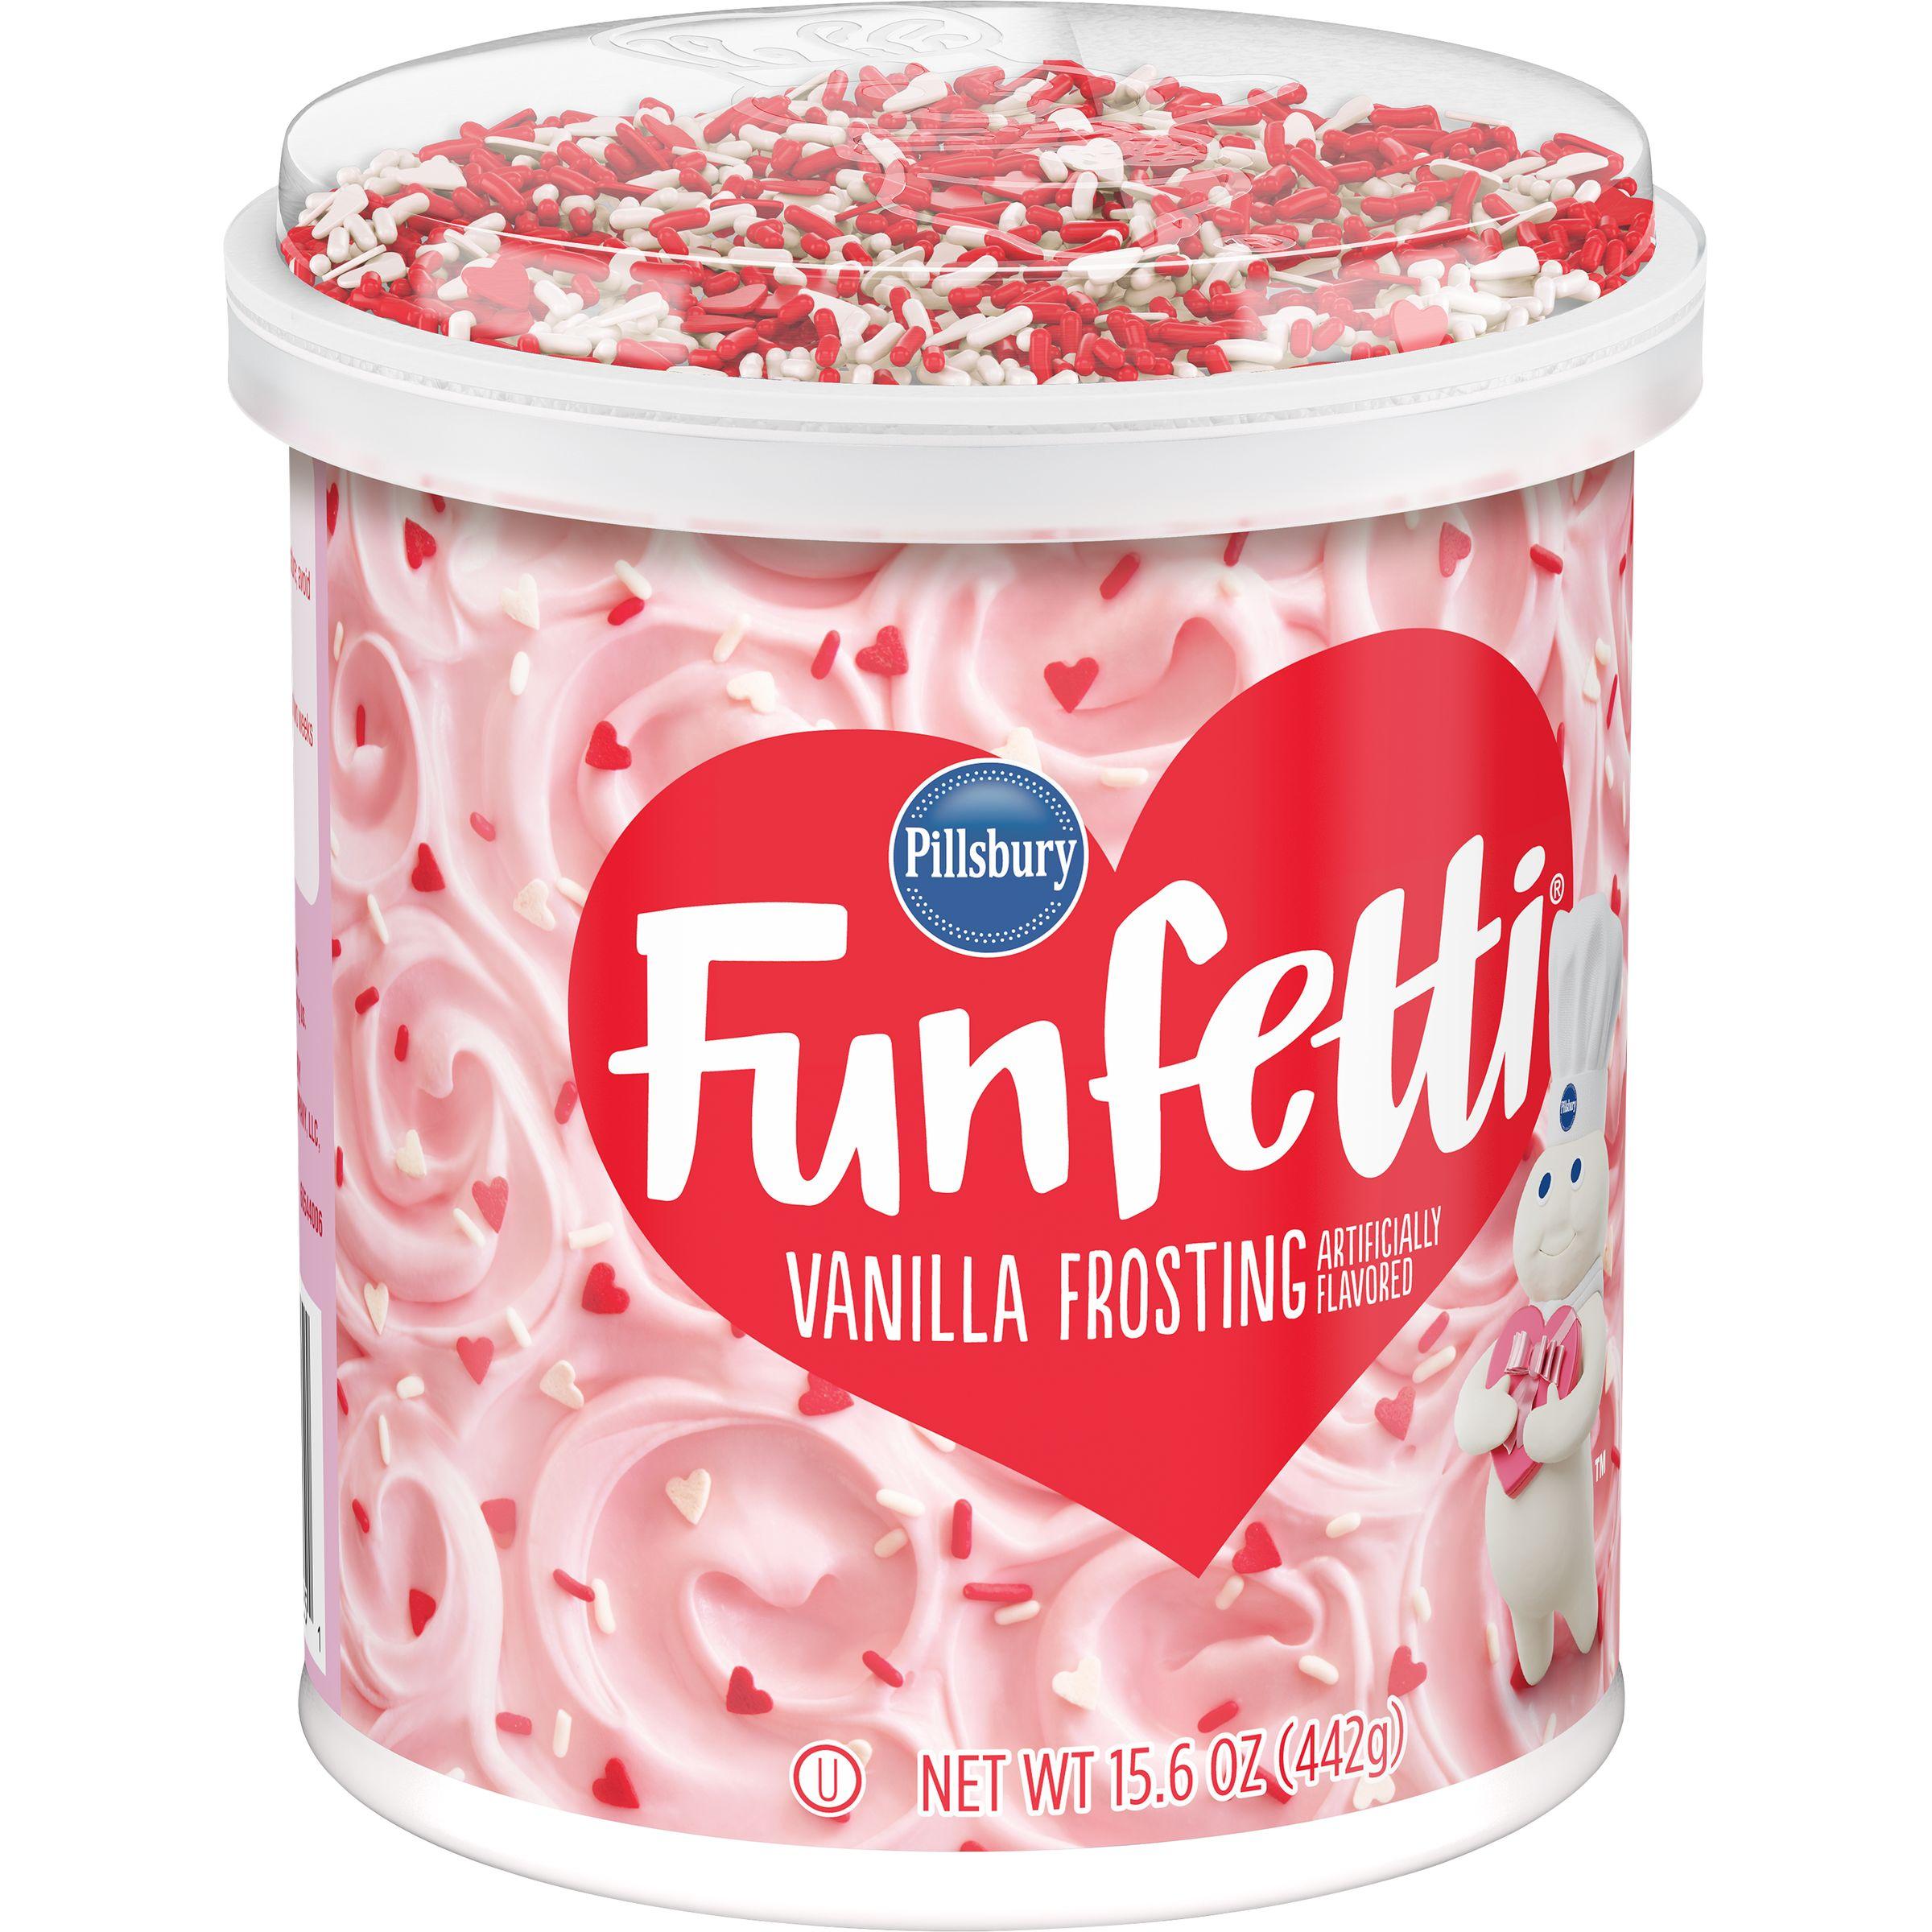 (2 Pack) Pillsbury Funfetti Valentine's Frosting, 15.6-Ounce